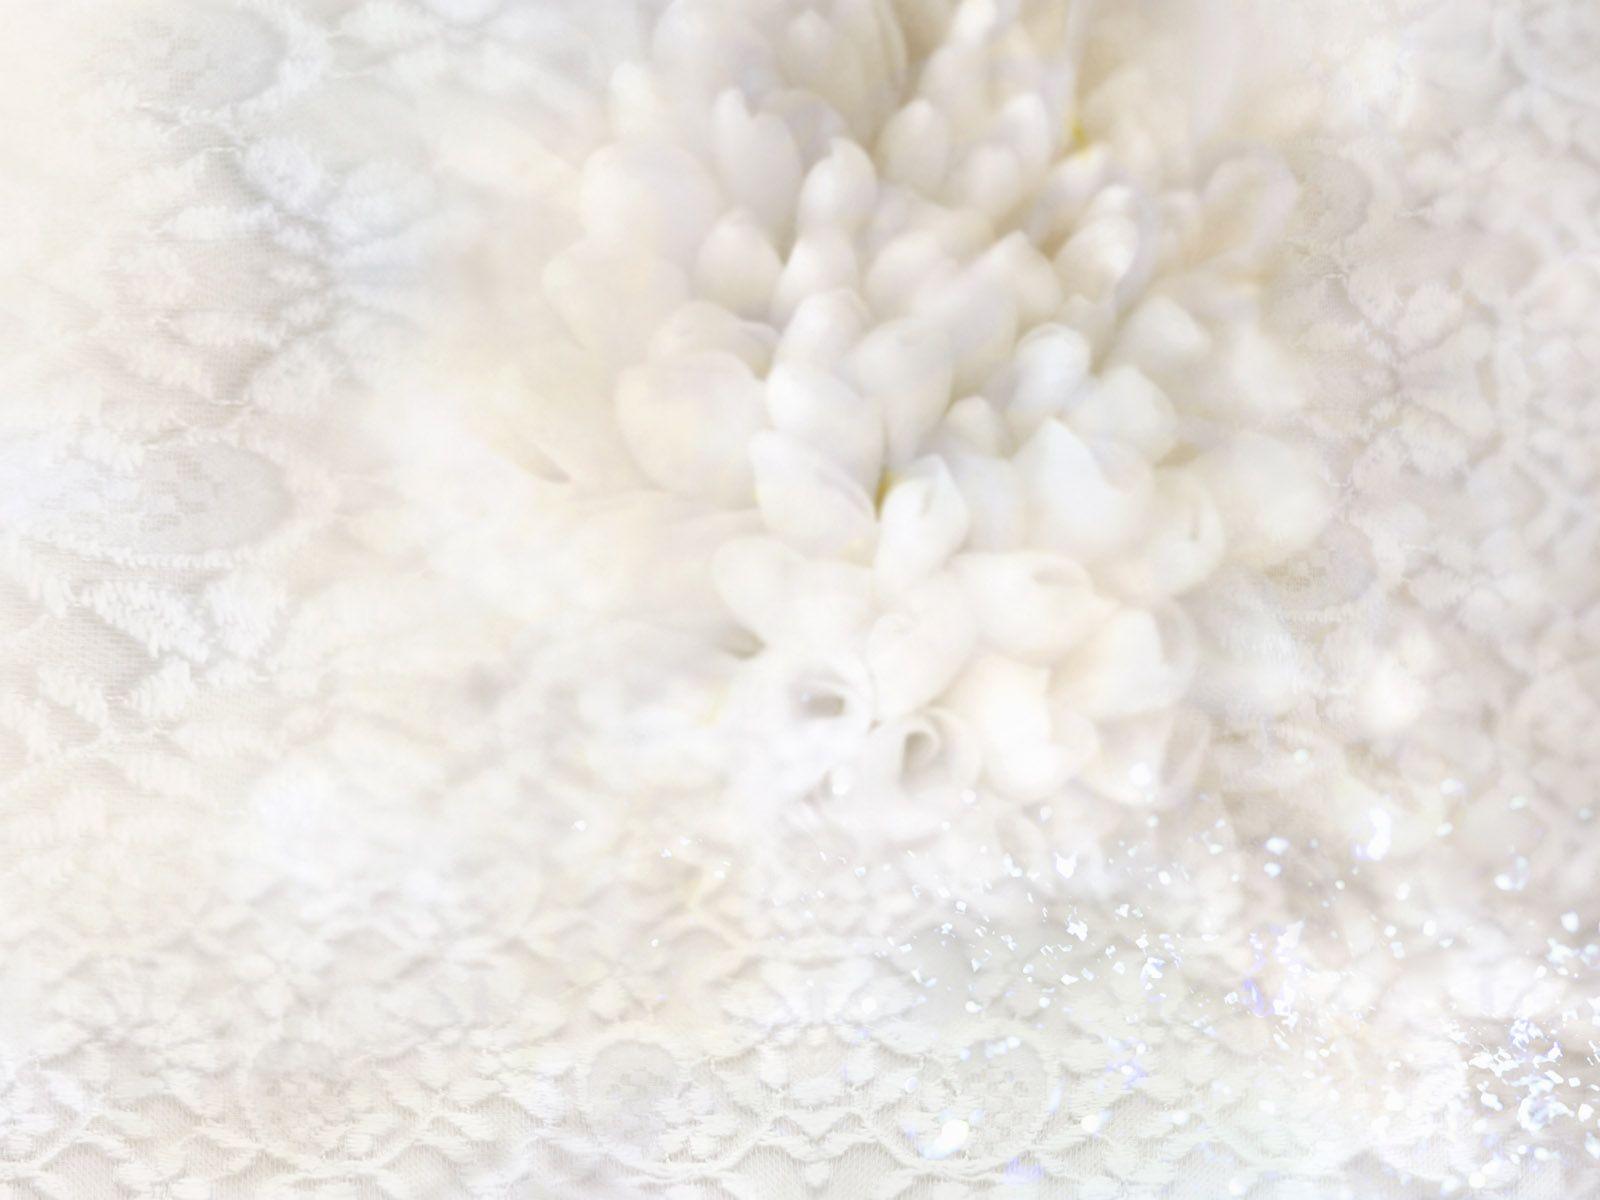 Wedding Background Wallpaper - WallpaperSafari